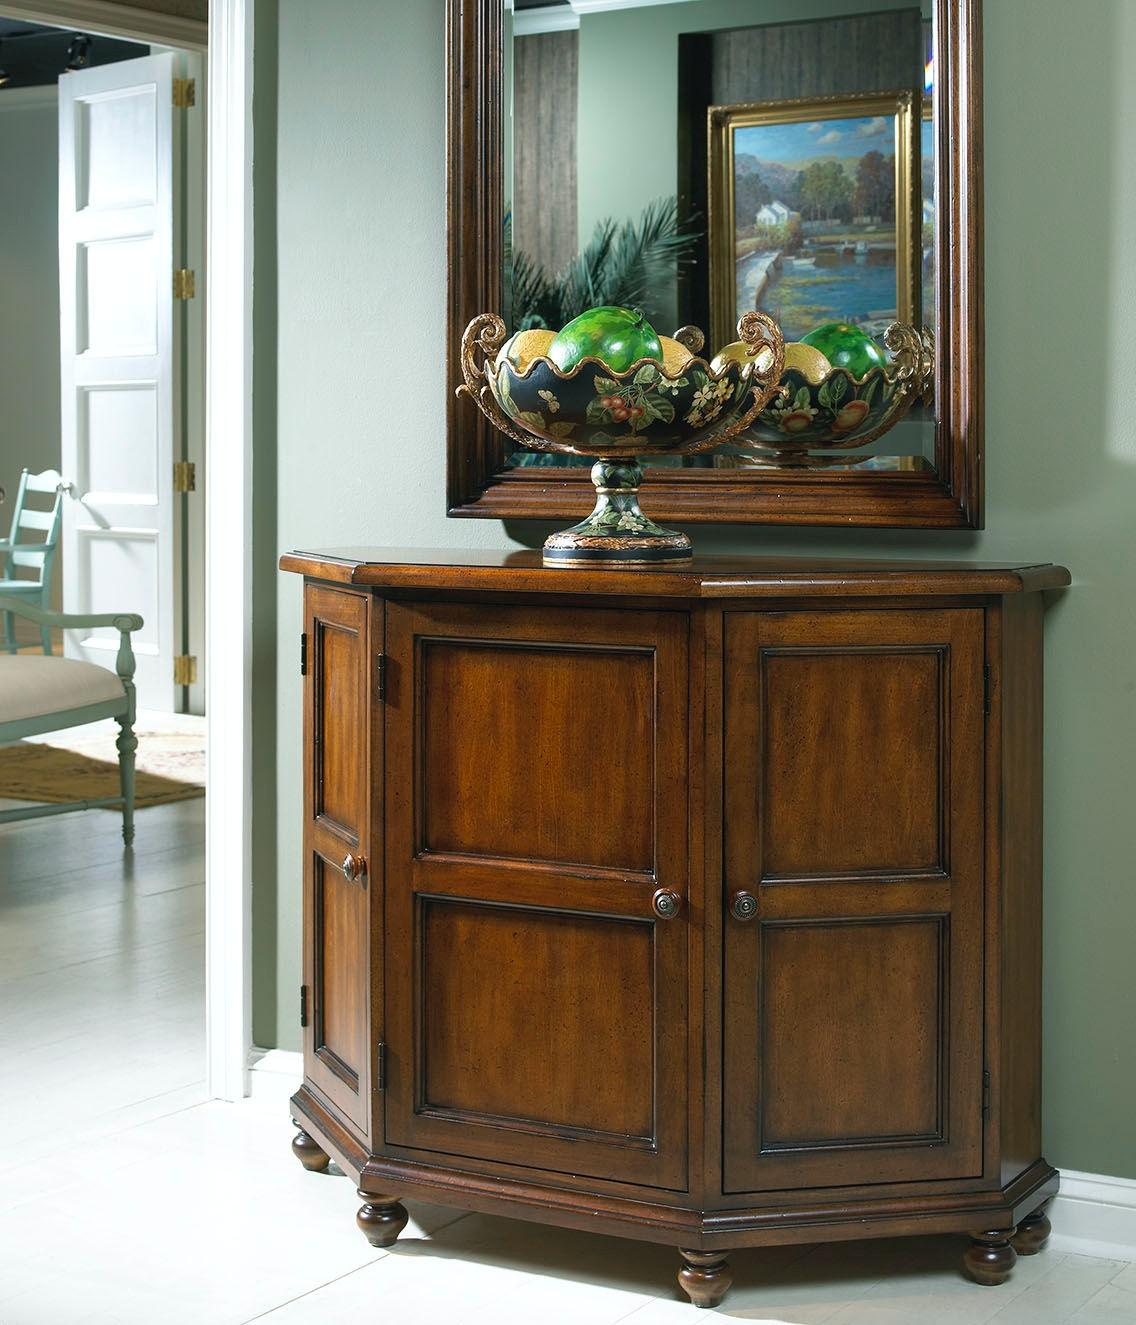 living room cabinet classic ideas cabinets bartlett home furnishings memphis tn fine furniture design commode 1050 942